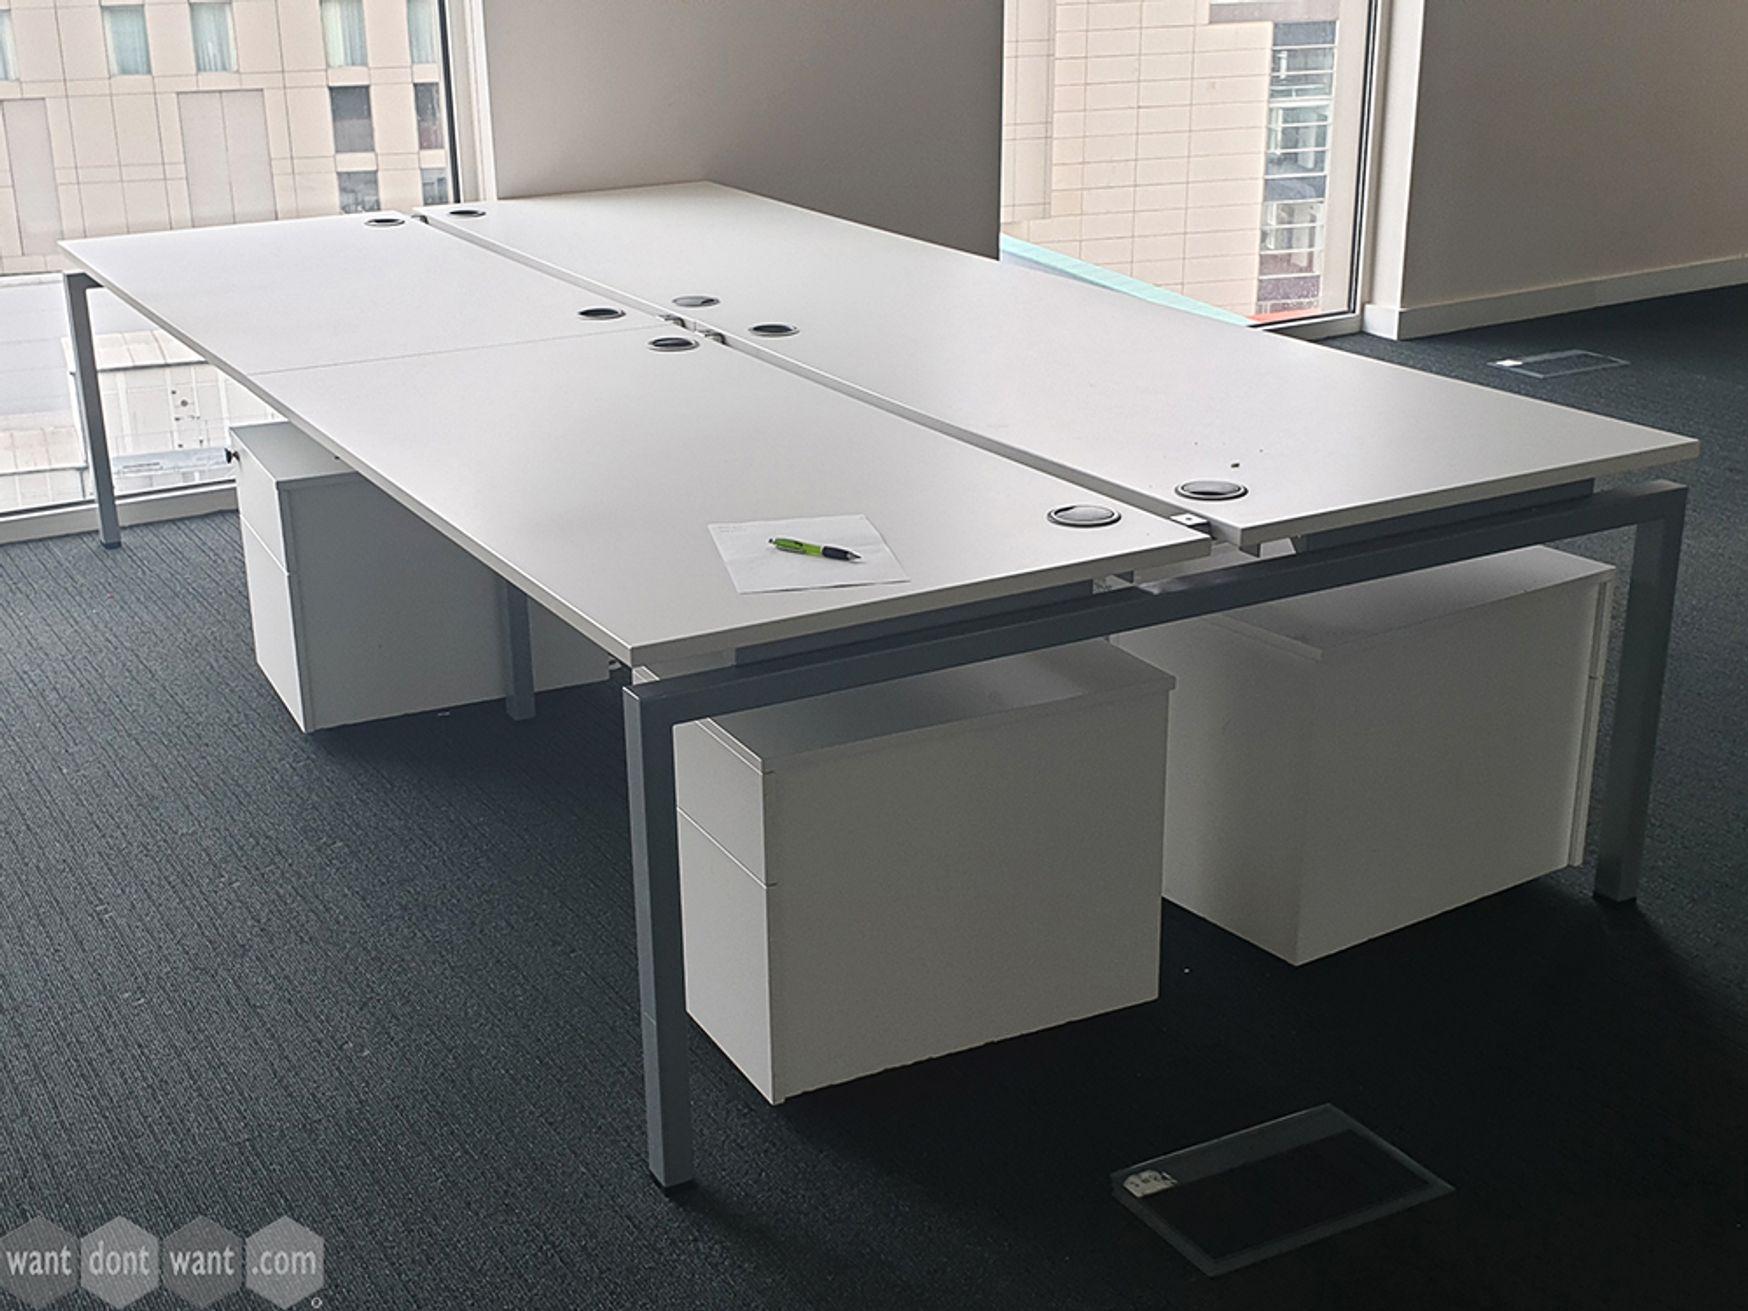 Used 1600mm White Bench Desks